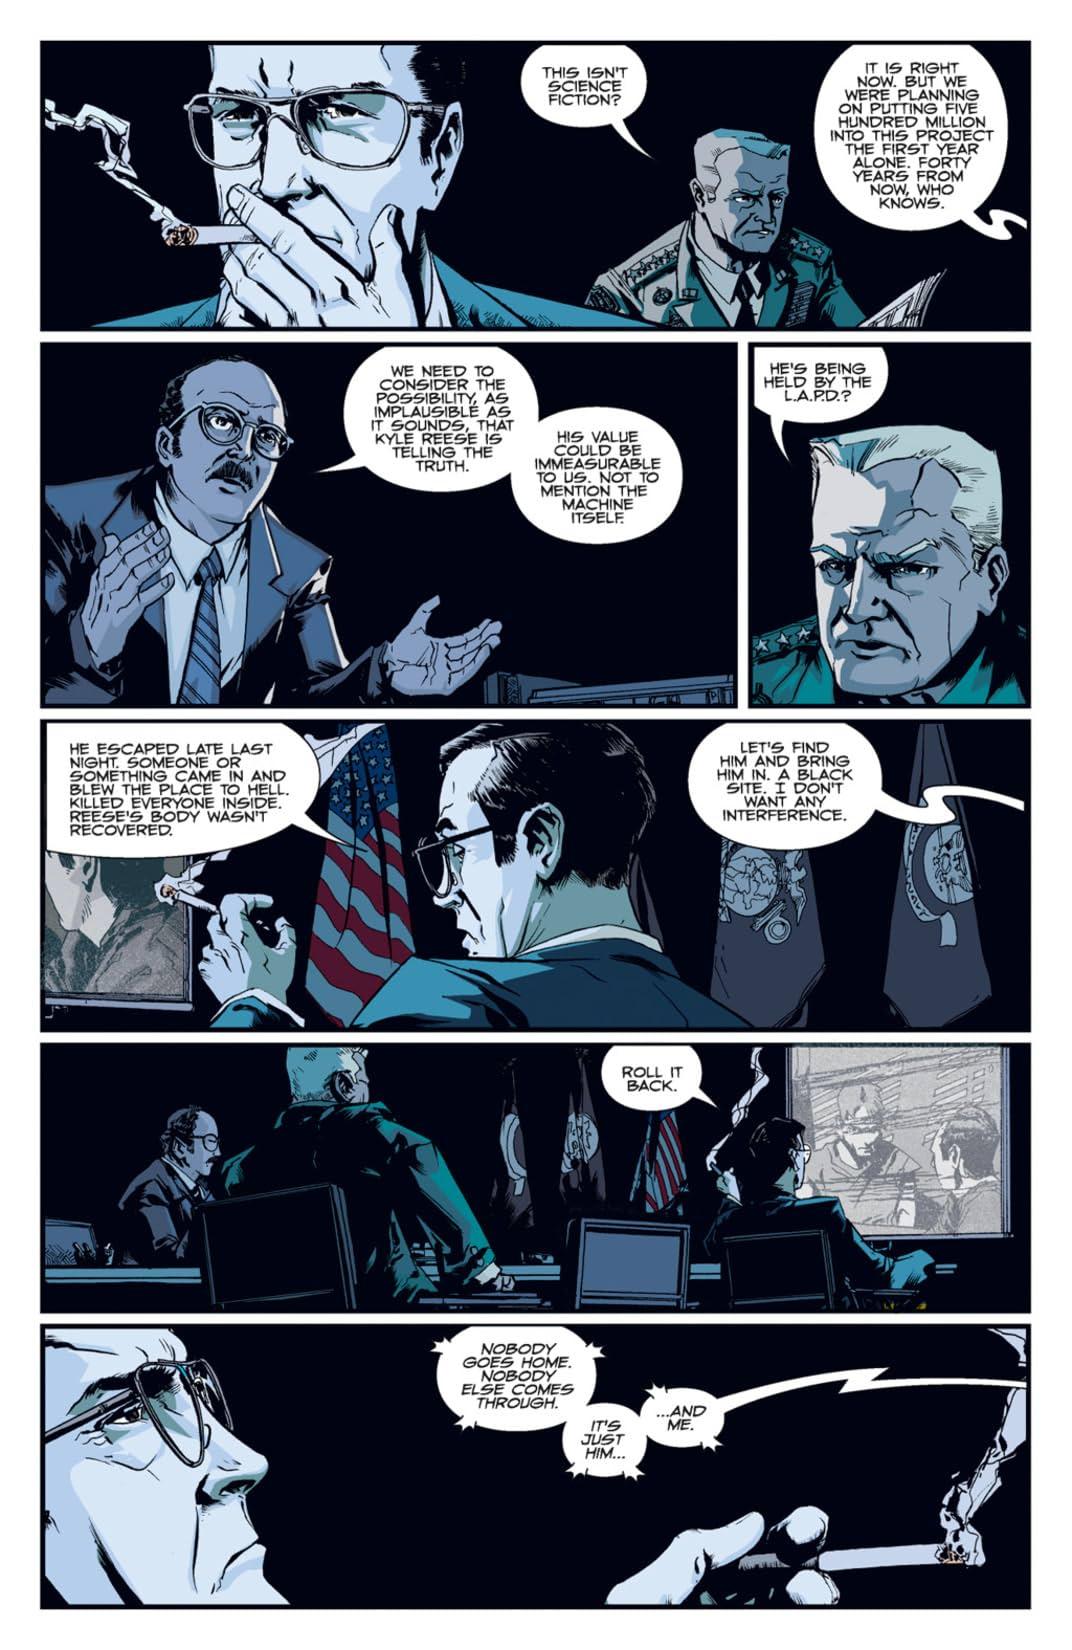 The Terminator: 1984 #1